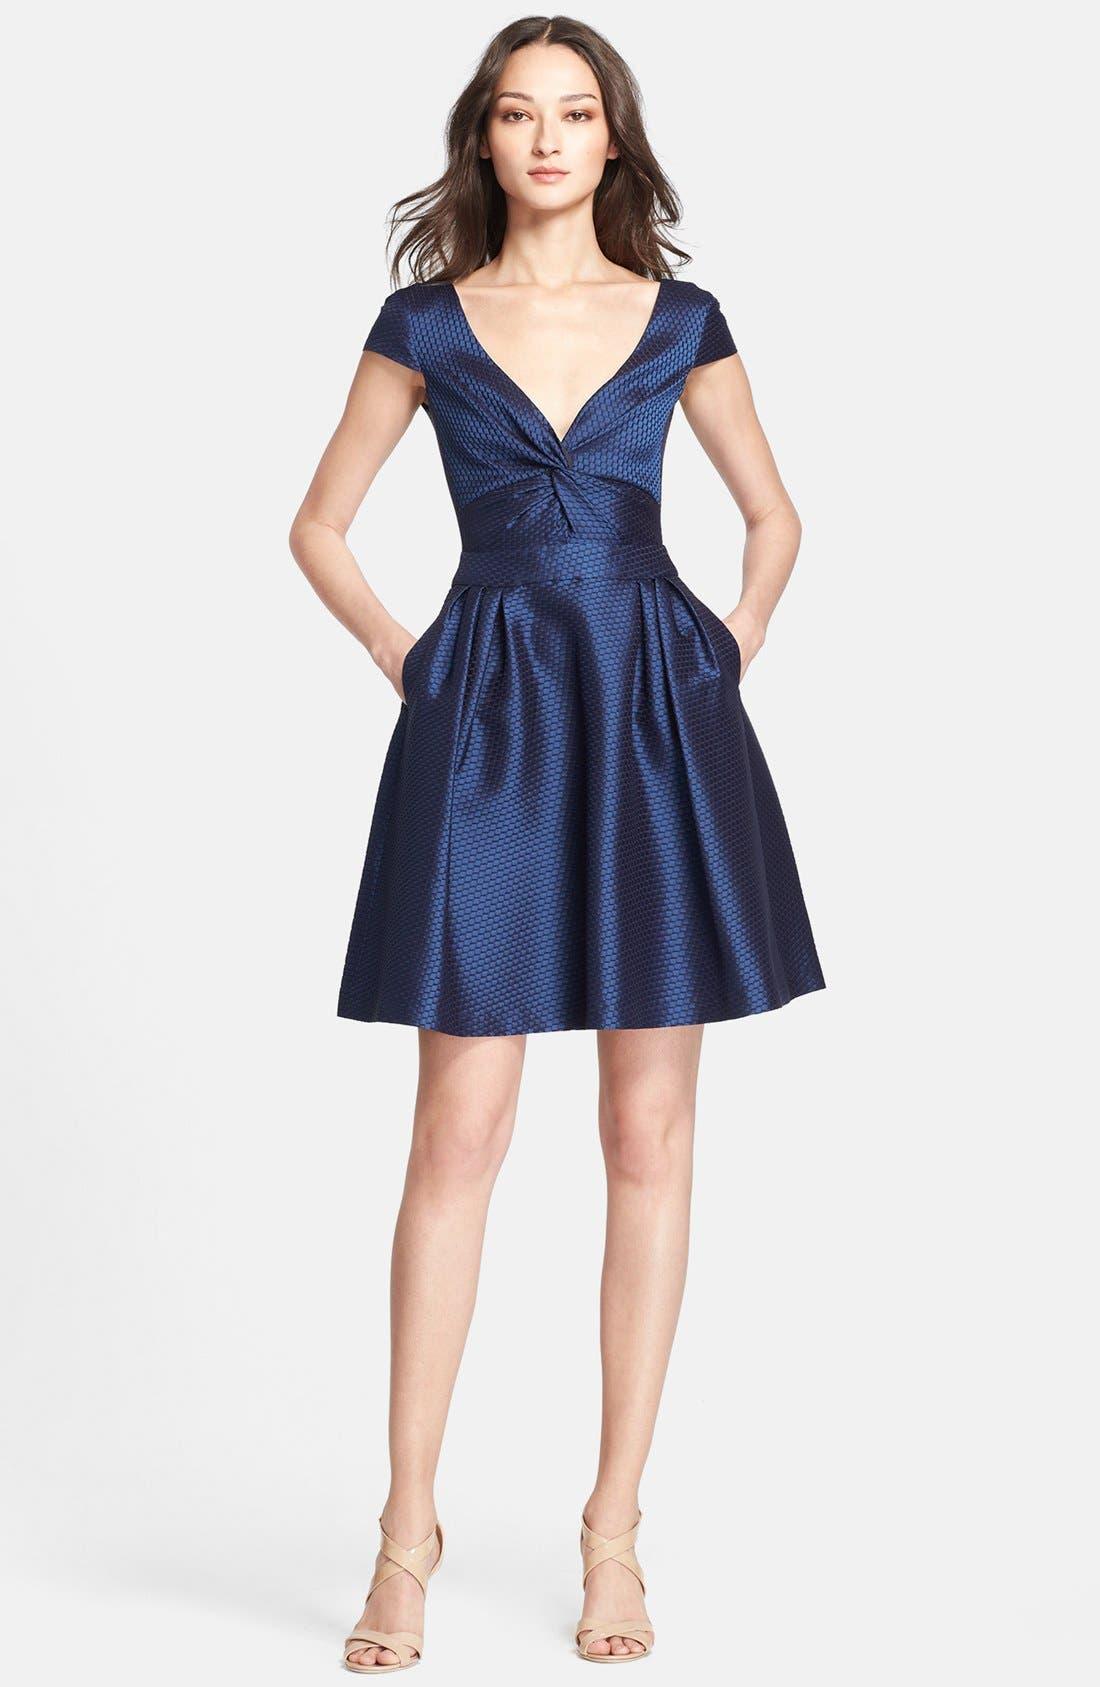 Alternate Image 1 Selected - Armani Collezioni Honeycomb Weave Full Skirt Dress